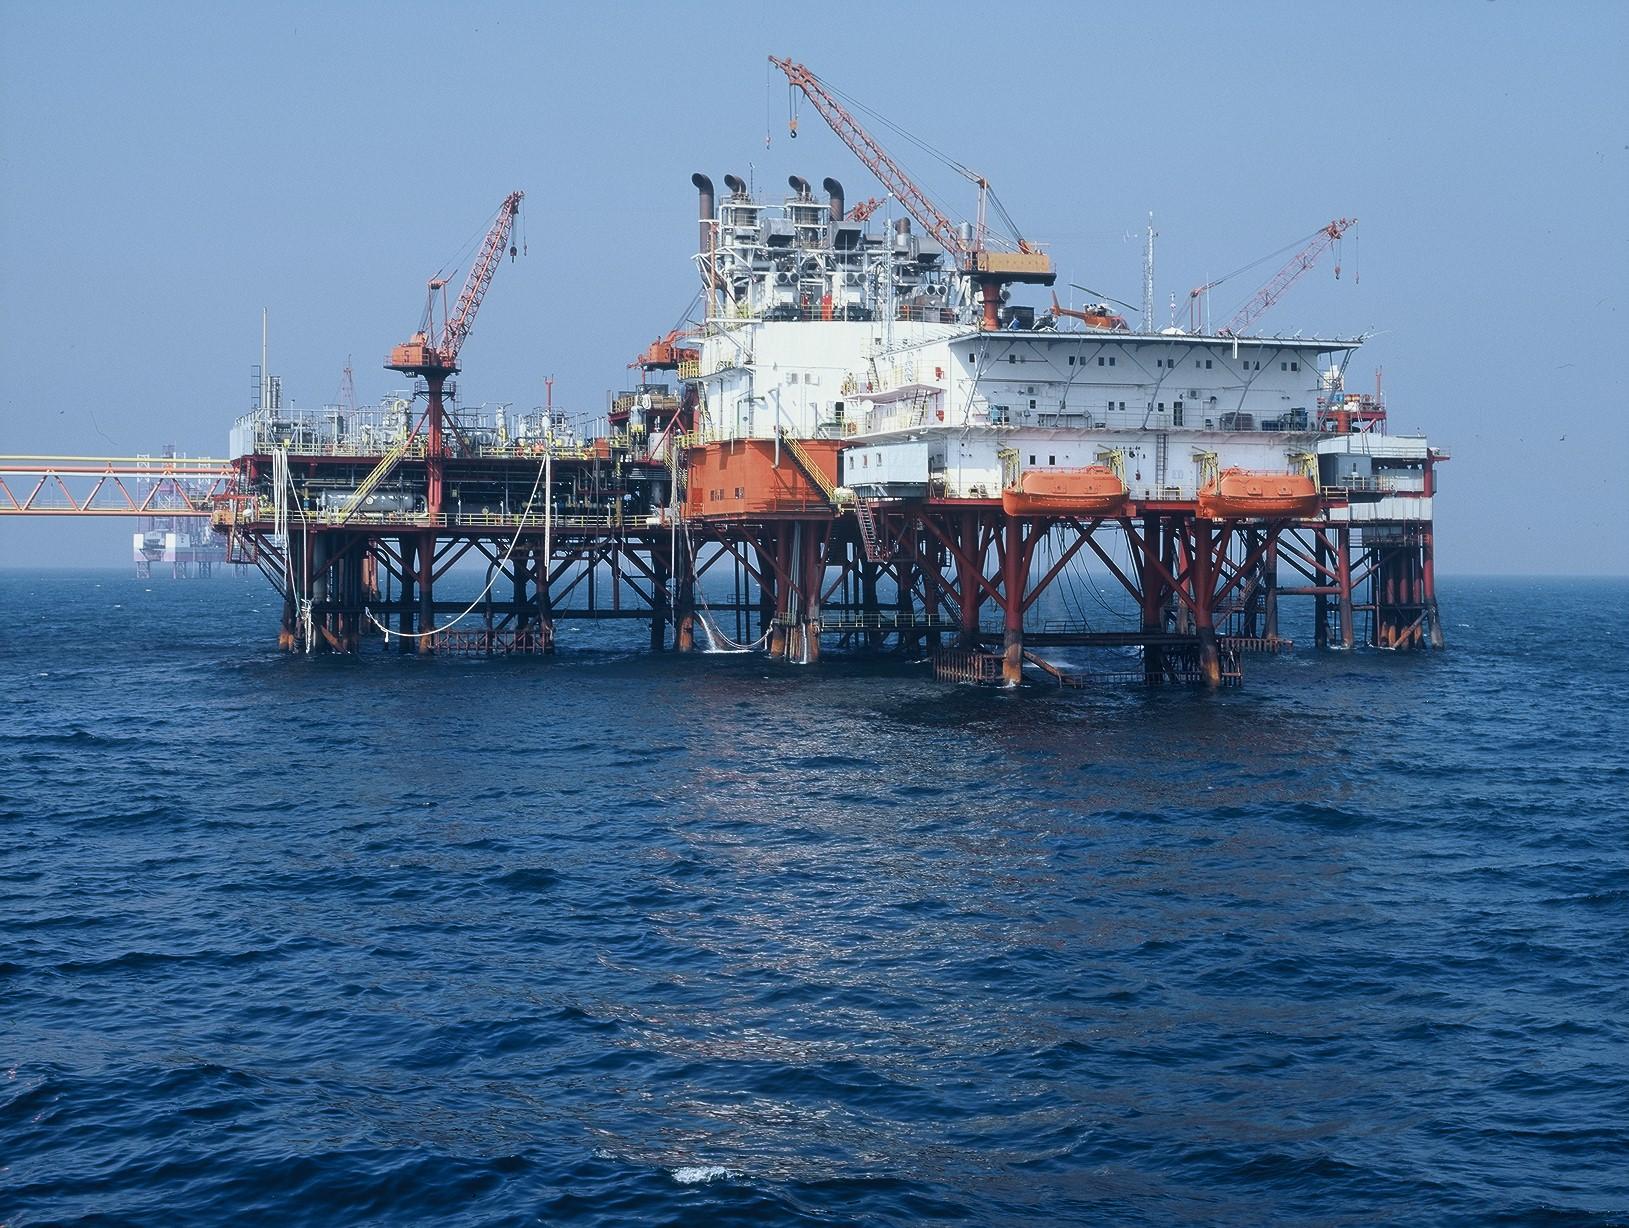 Romania's Fondul Proprietatea to sell 2.5% stake in OMV Petrom